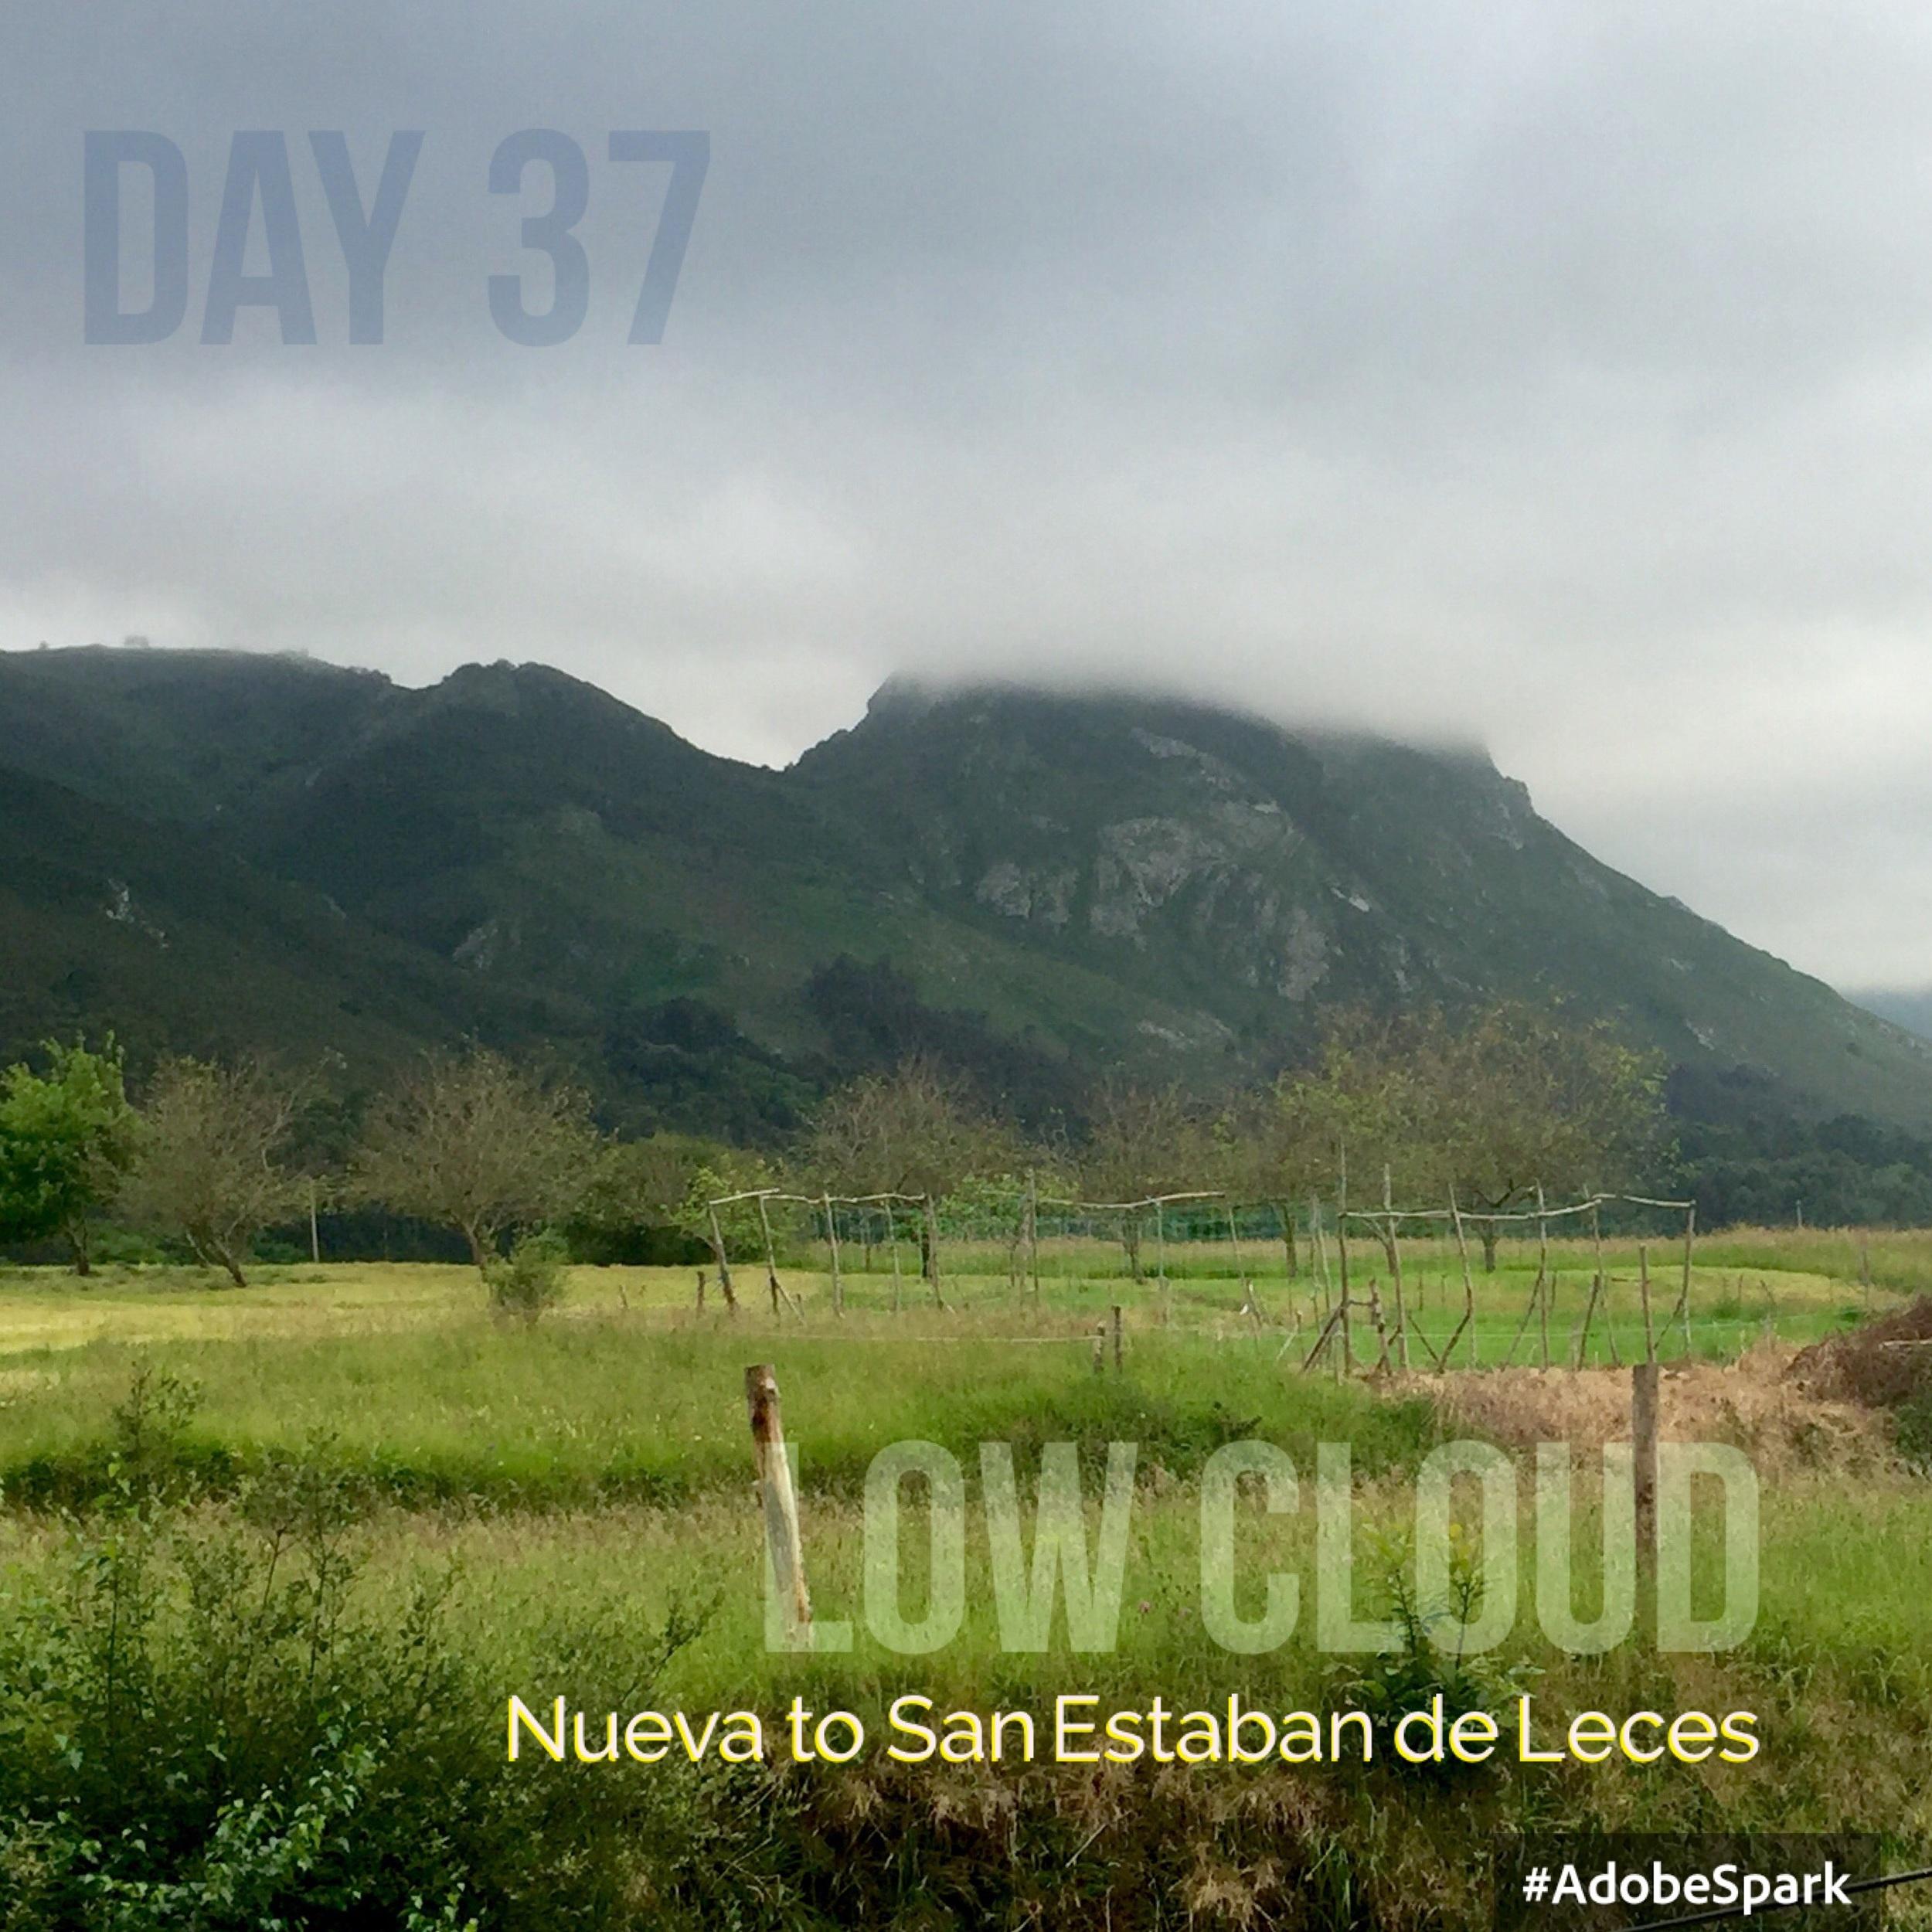 The extraordinary Picos mountains